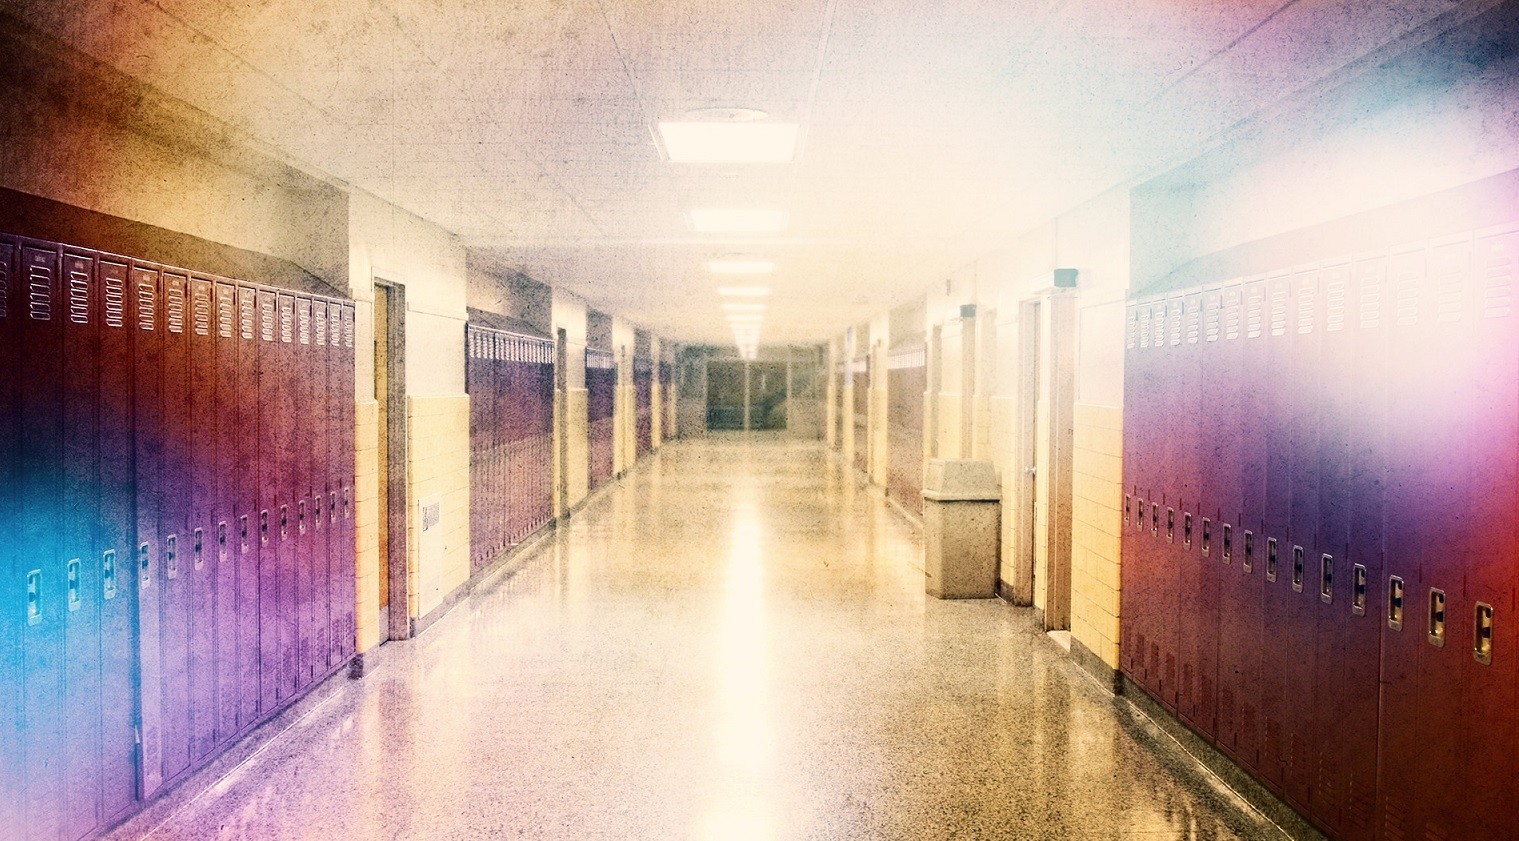 School Threat_339504